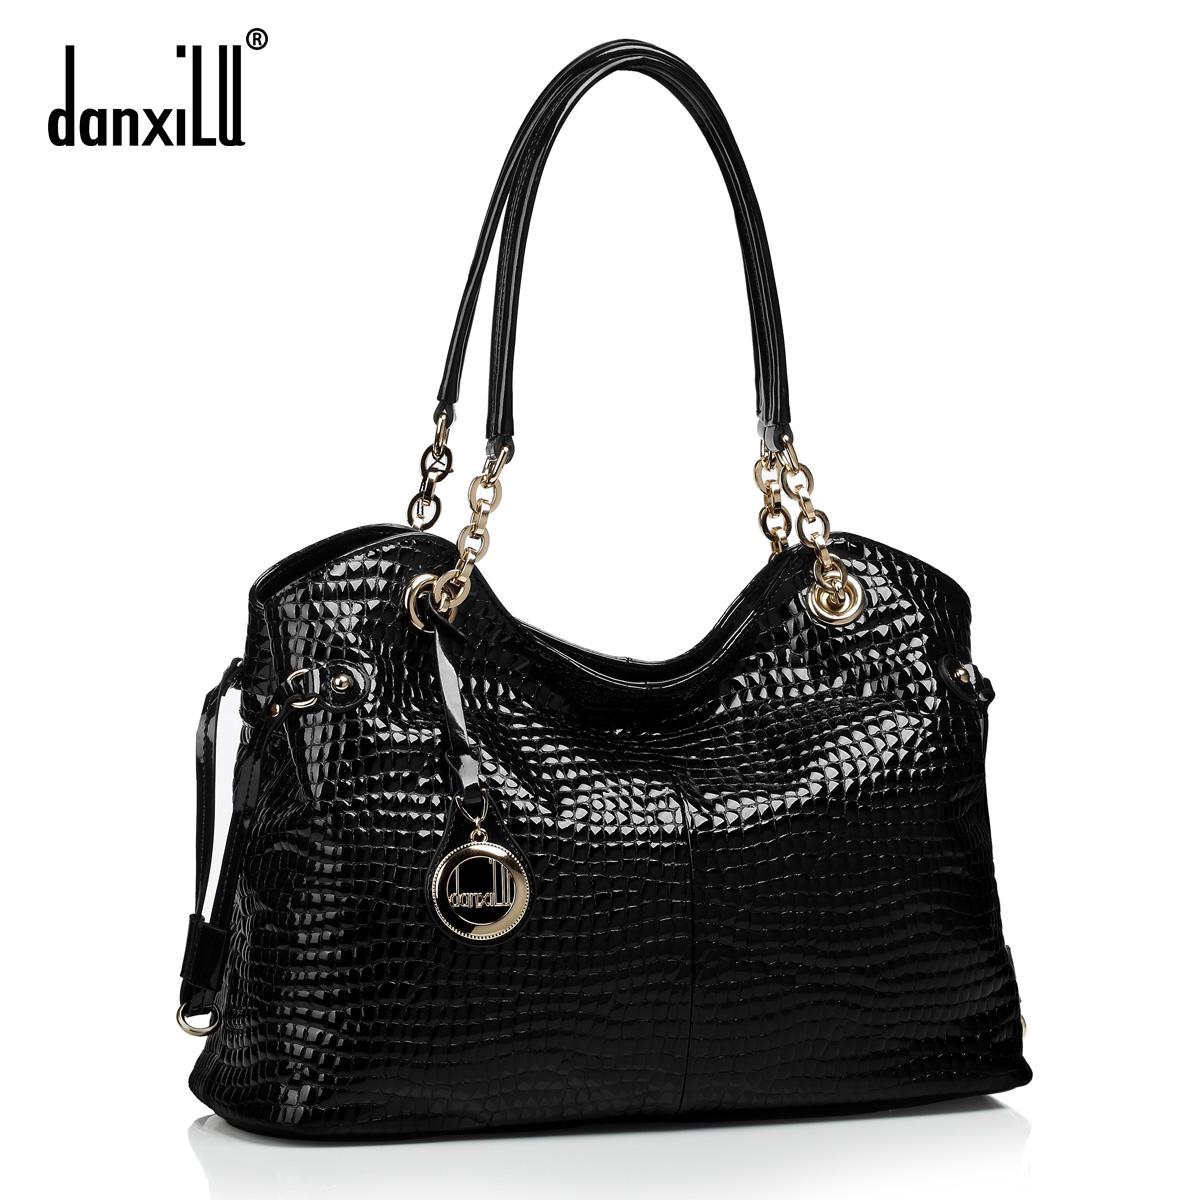 2015 Women Handbag Genuine Leather First Layer Of Cowhide Designers Brand Luxury Chain Bag Crocodile Shoulder Messenger Bags